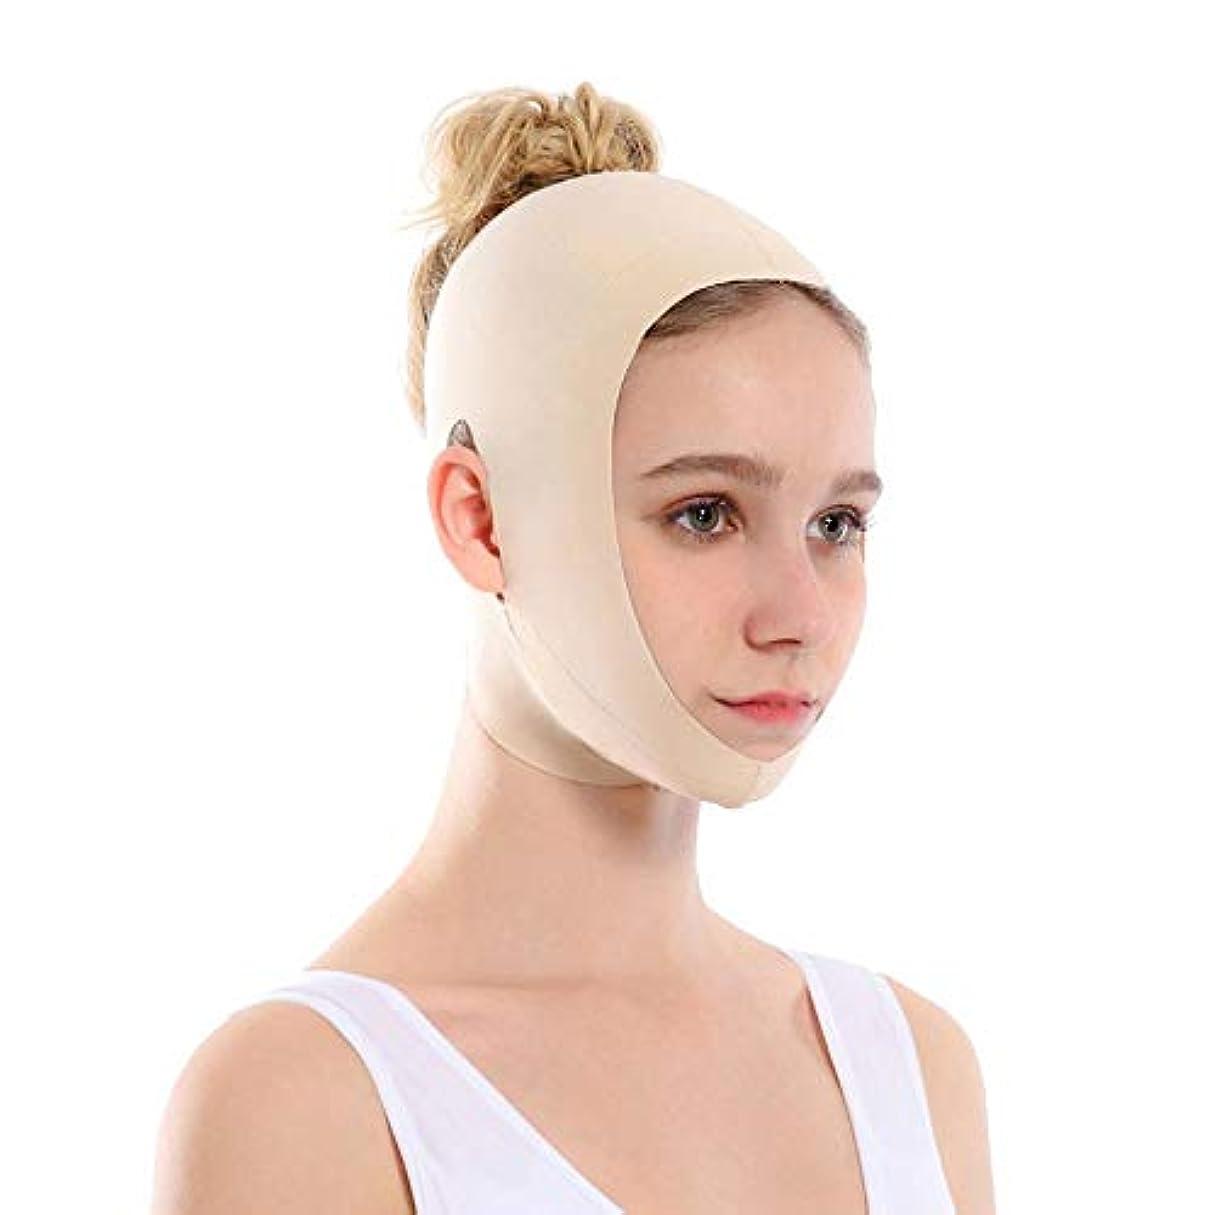 Minmin 顔を持ち上げるアーティファクトVフェイス包帯リフティング引き締め睡眠薄い顔を整形持ち上げる顔を二重あご矯正 - 肌の色 みんみんVラインフェイスマスク